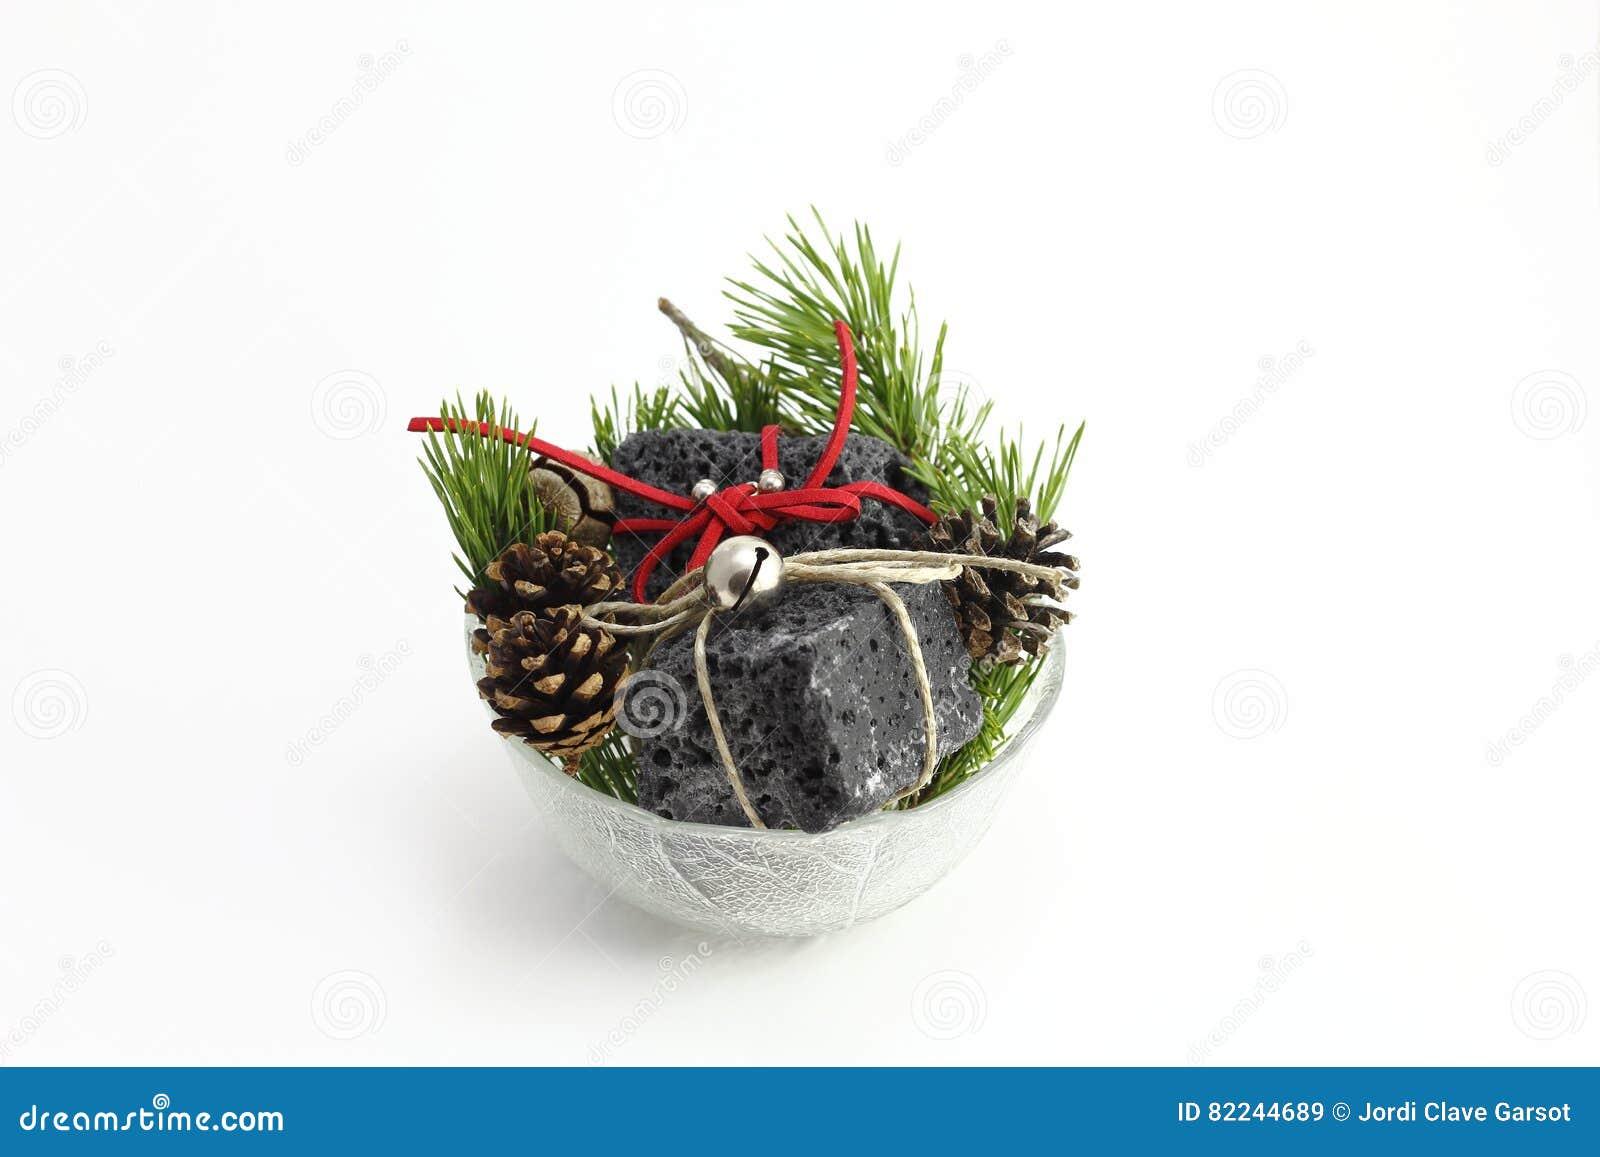 Christmas coal stock image. Image of carbon, food, gift - 82244689